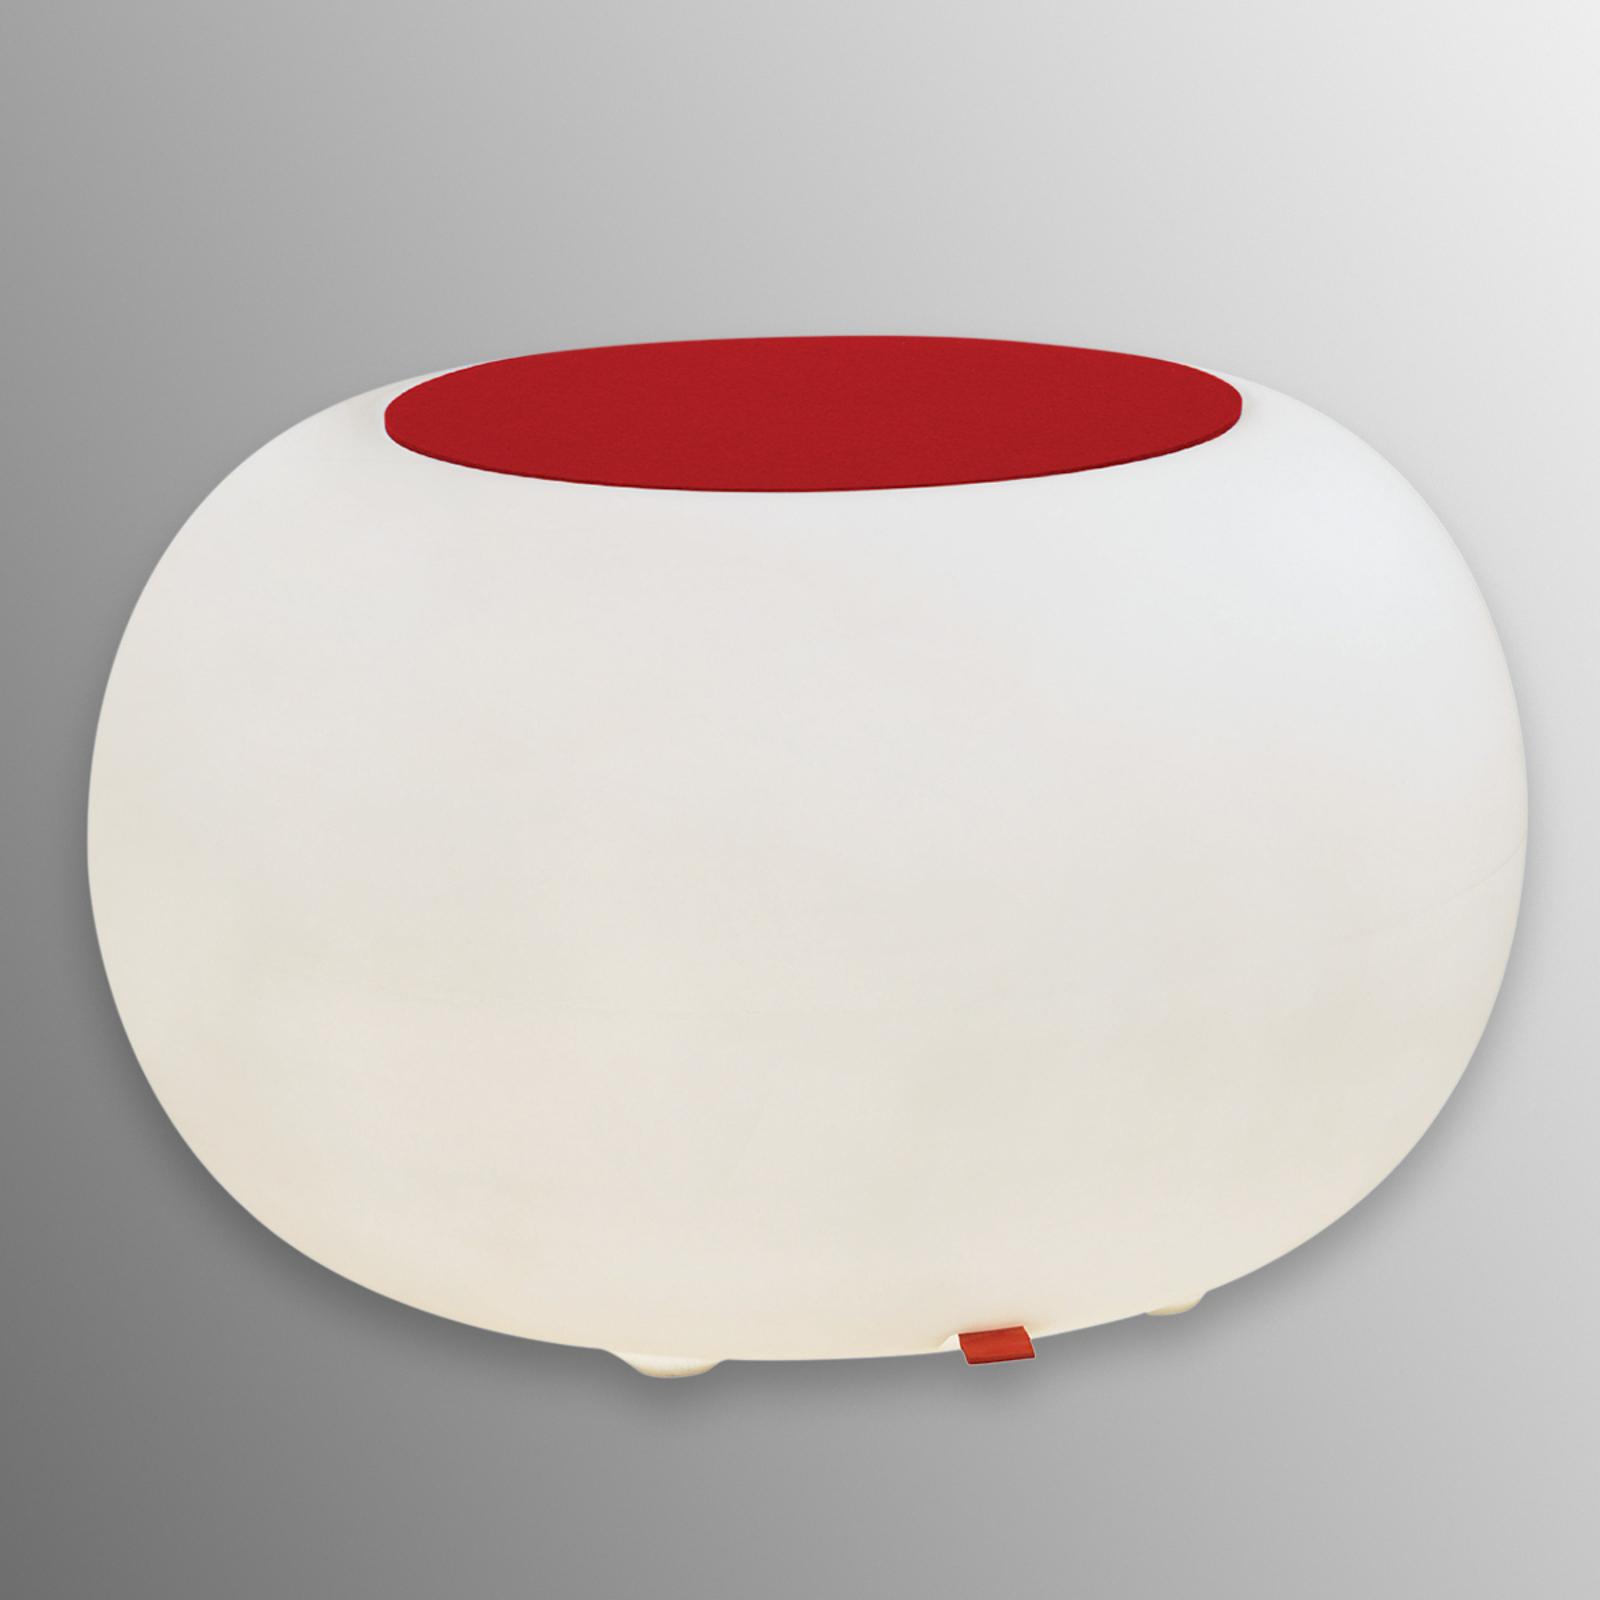 Bubble Outdoor bord, hvitt lys + rød filt